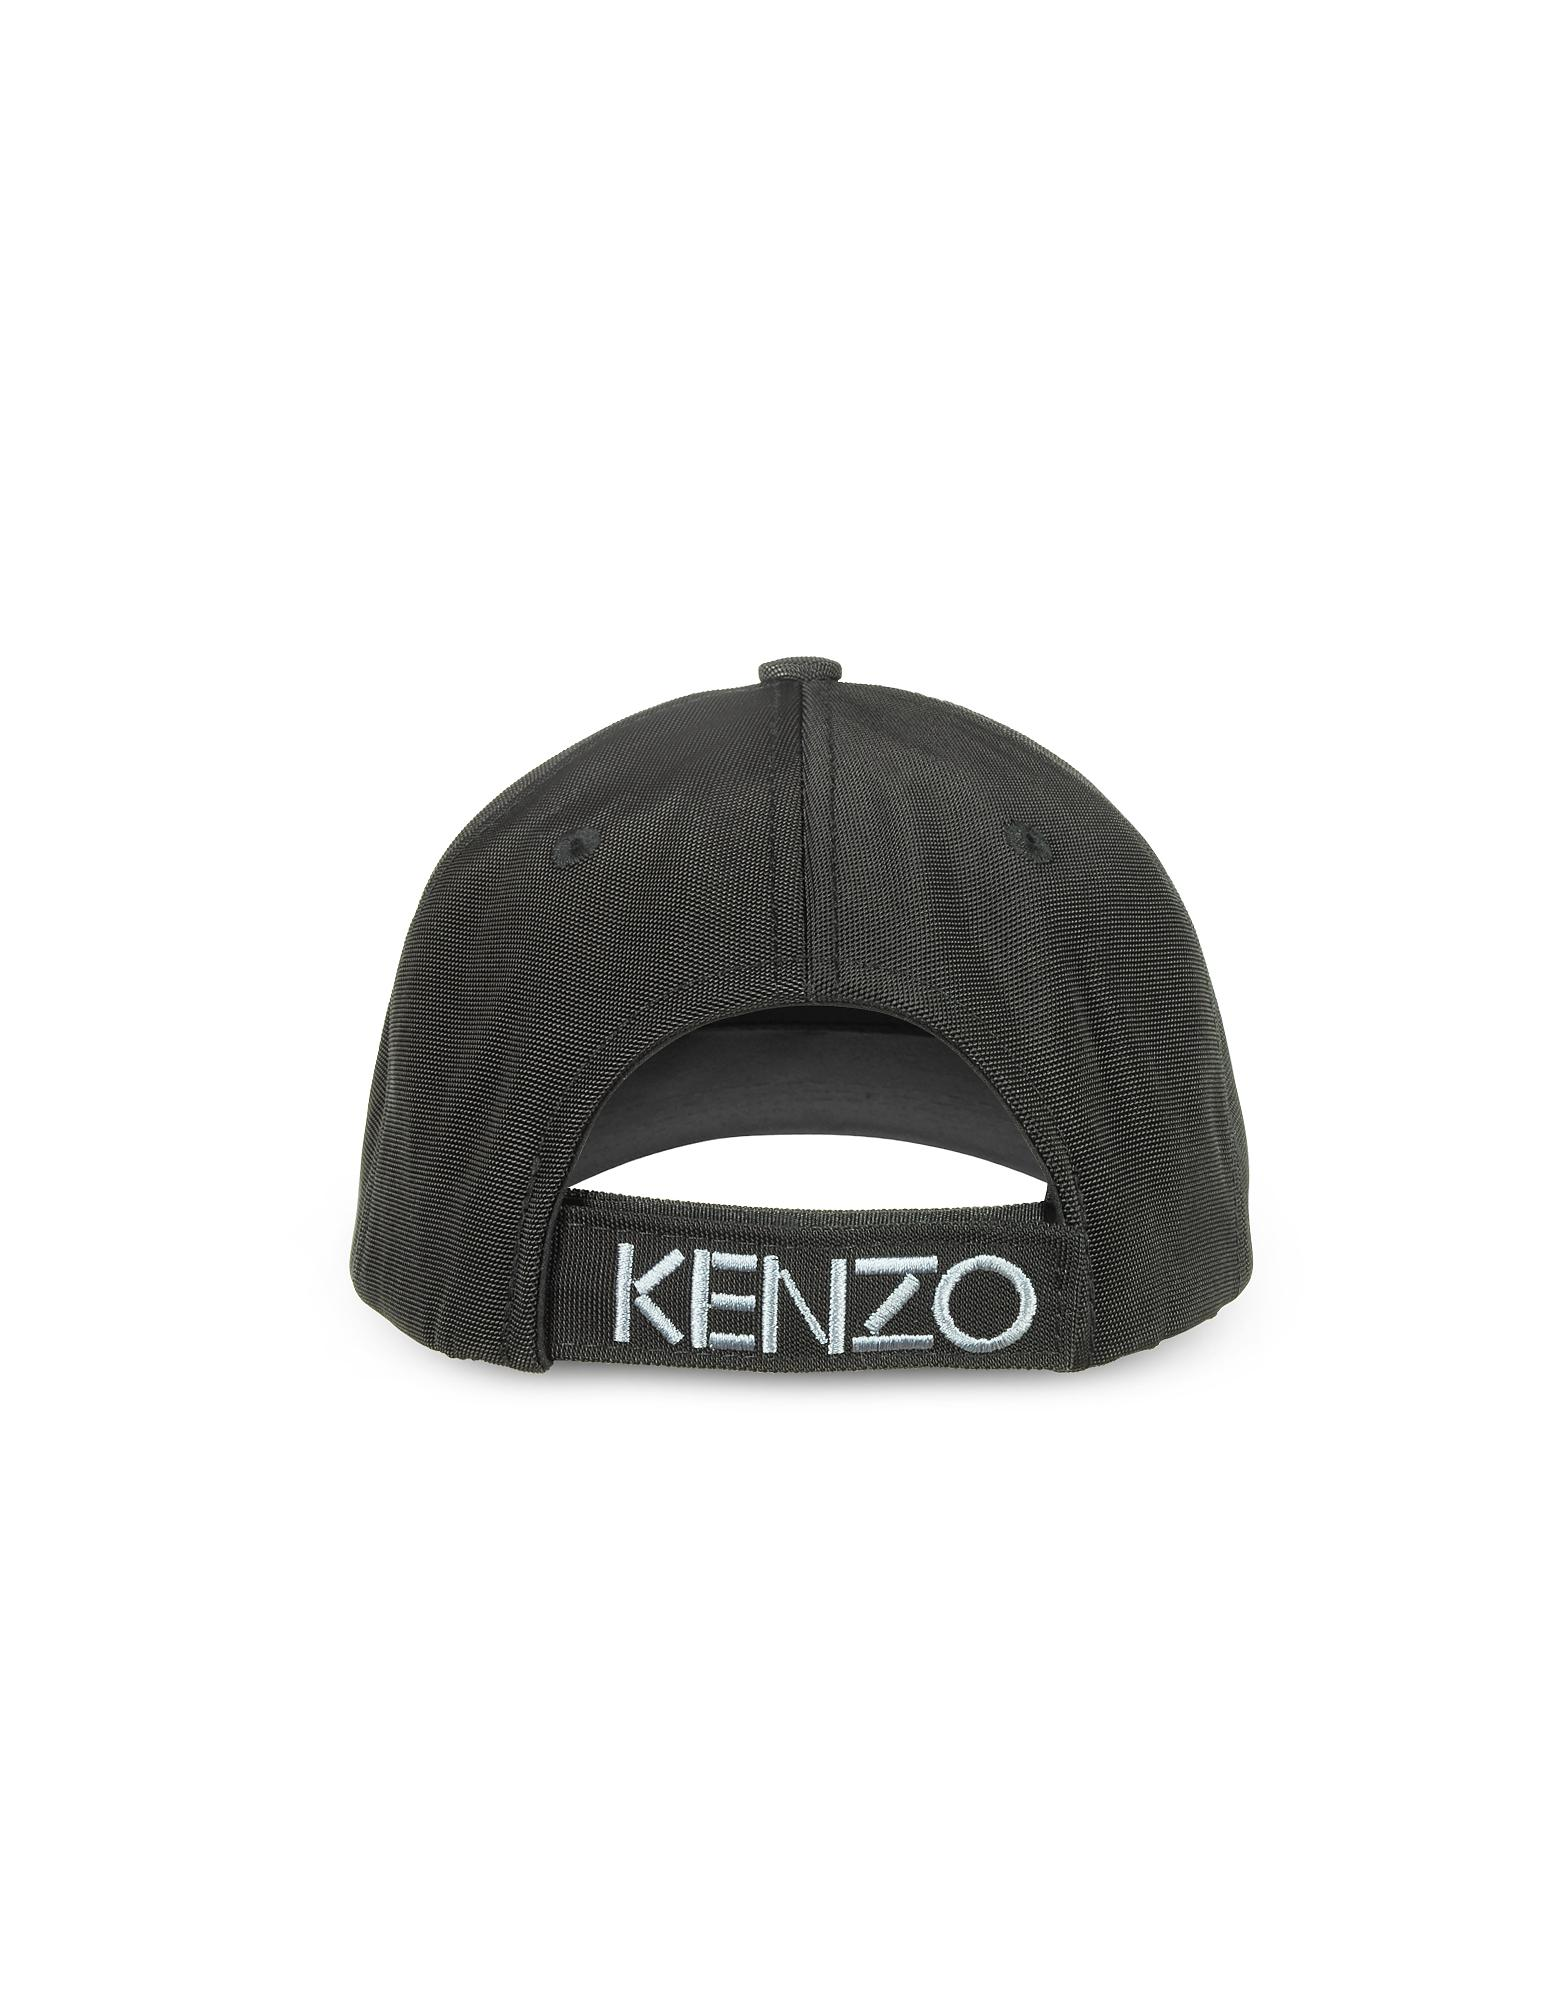 Kenzo Black Canvas Tiger Baseball Cap in Black for Men - Lyst 37e8bdb04ecb